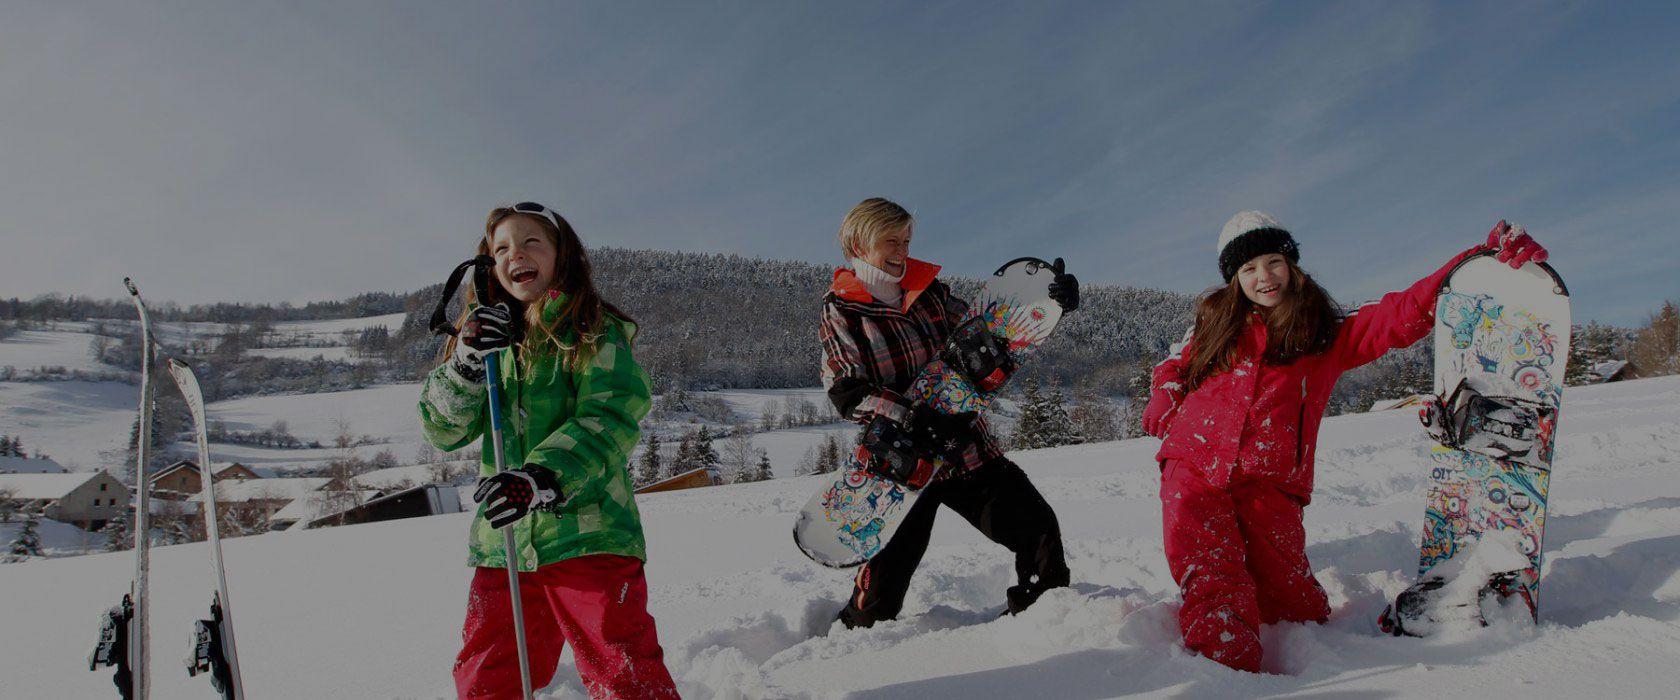 Ski à la montagne